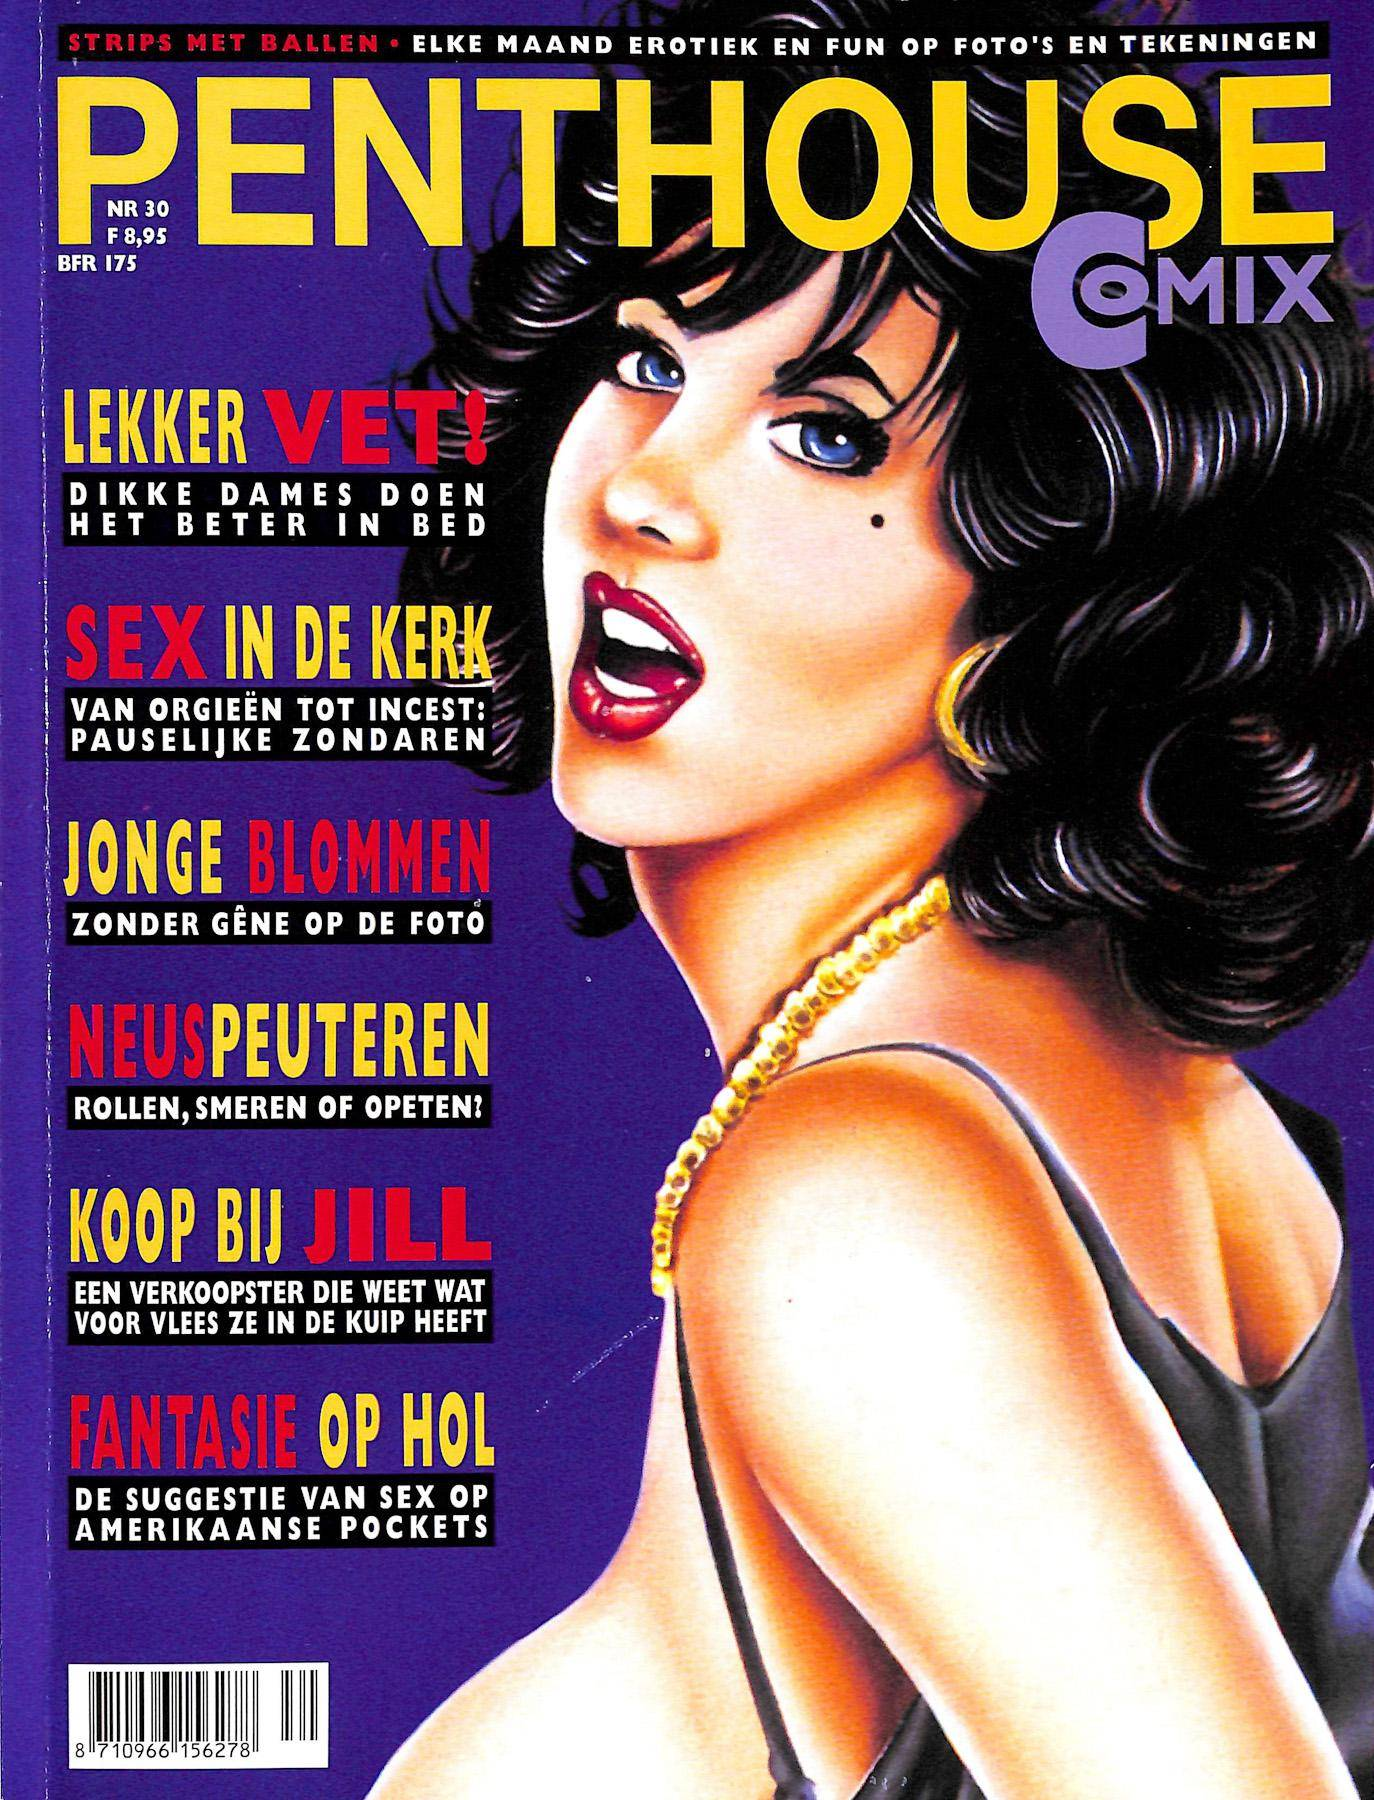 Penthouse Comics Magazine - 30 - Deel 30 cbr